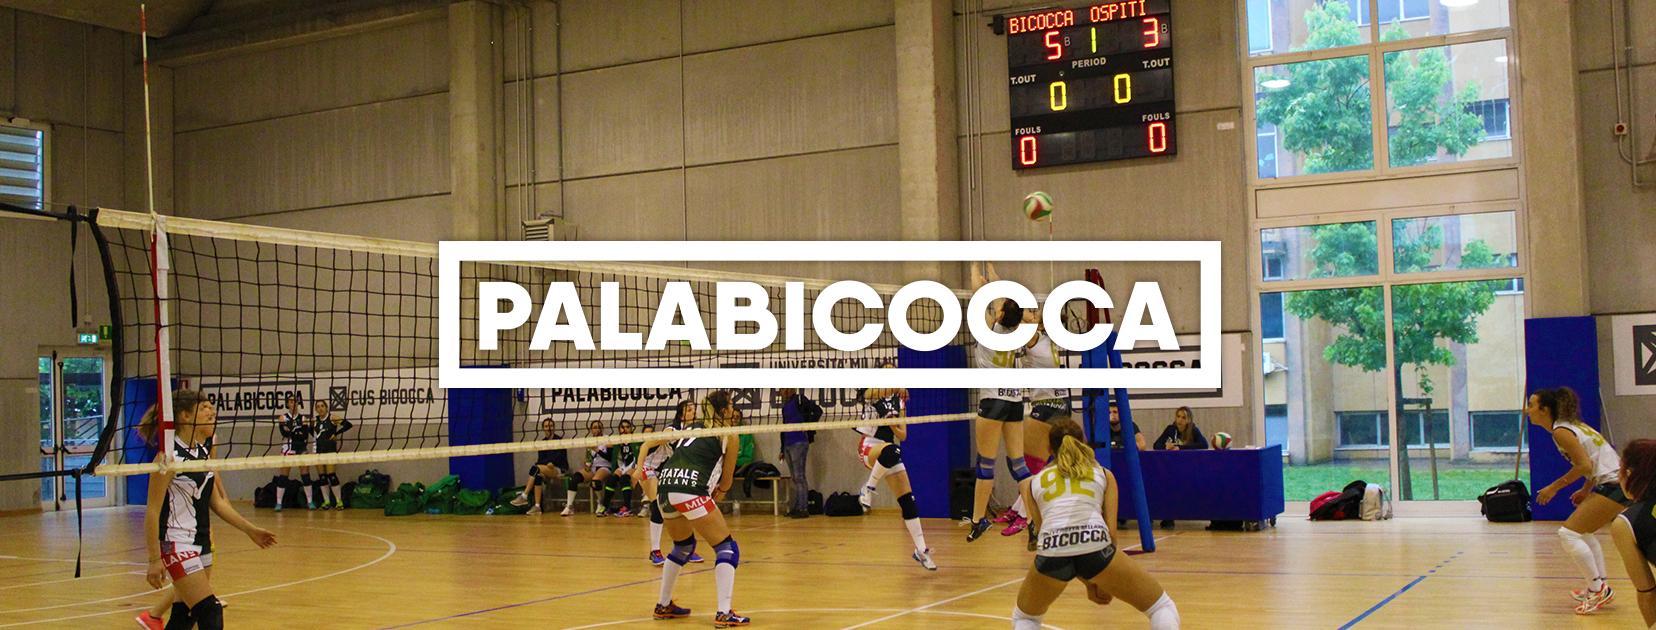 PalaBicocca